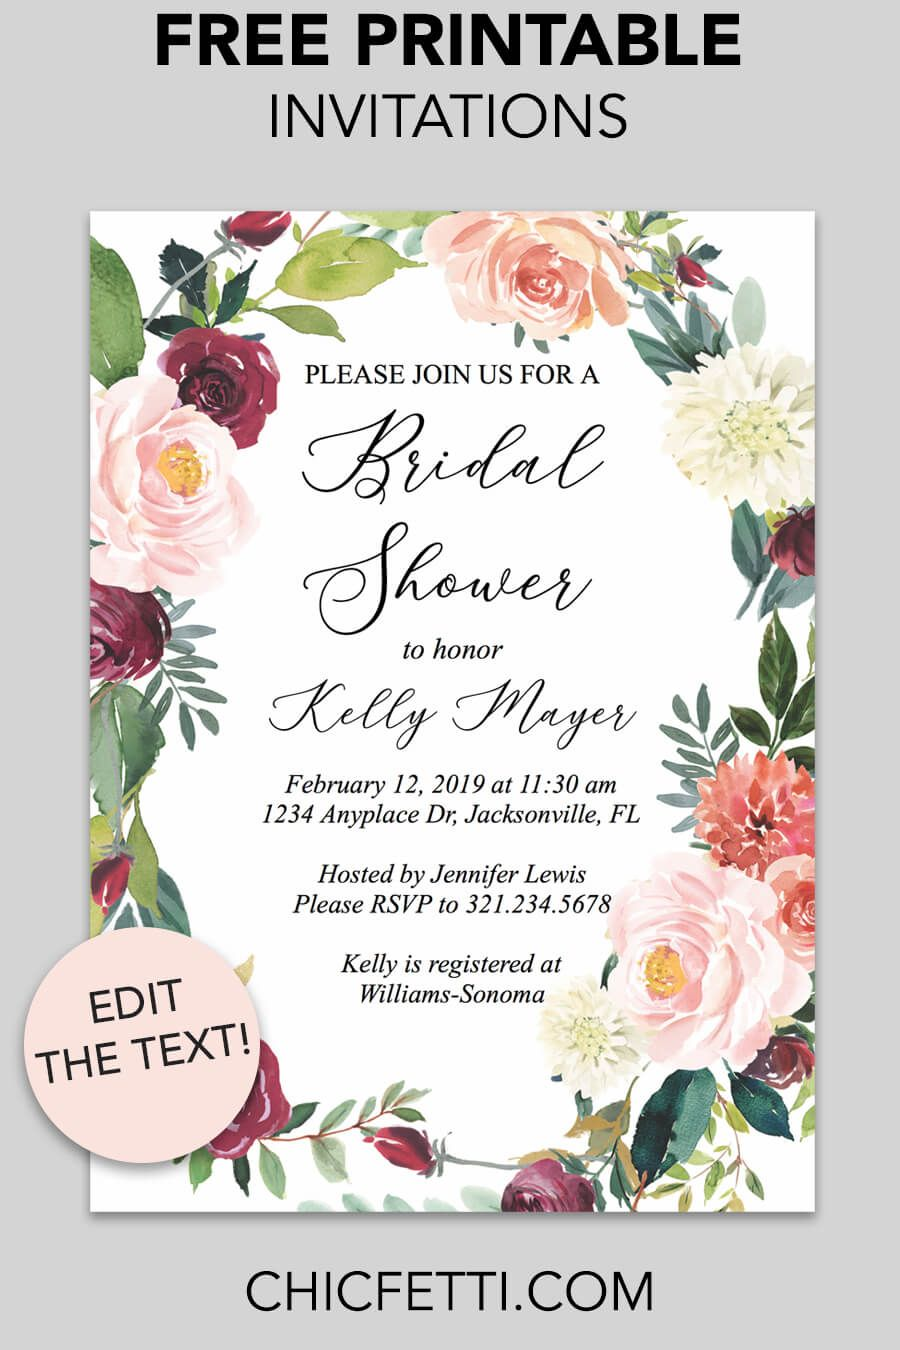 Bridal Shower Printable Invitation Fall Floral Wreath Chicfetti Bridal Shower Invitations Printable Free Bridal Shower Invitations Printable Bridal Shower Invitations Free